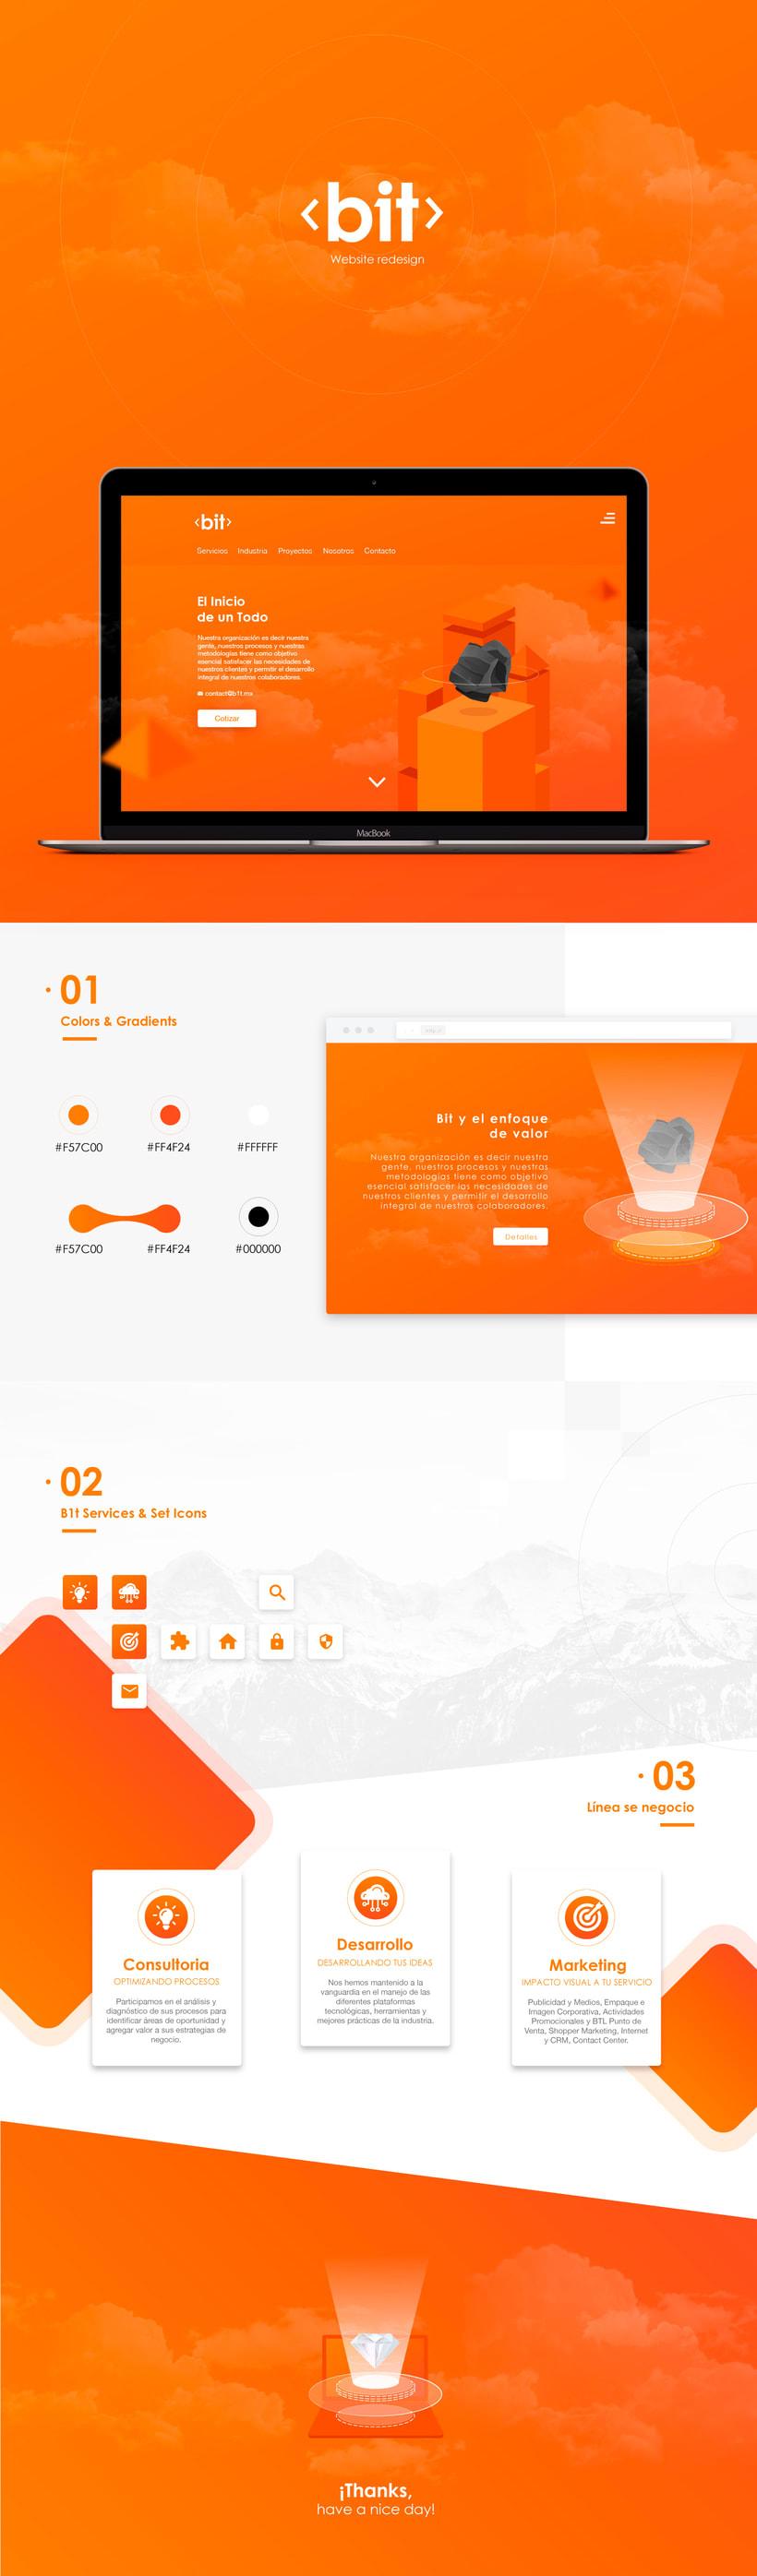 B1t website redesign 0